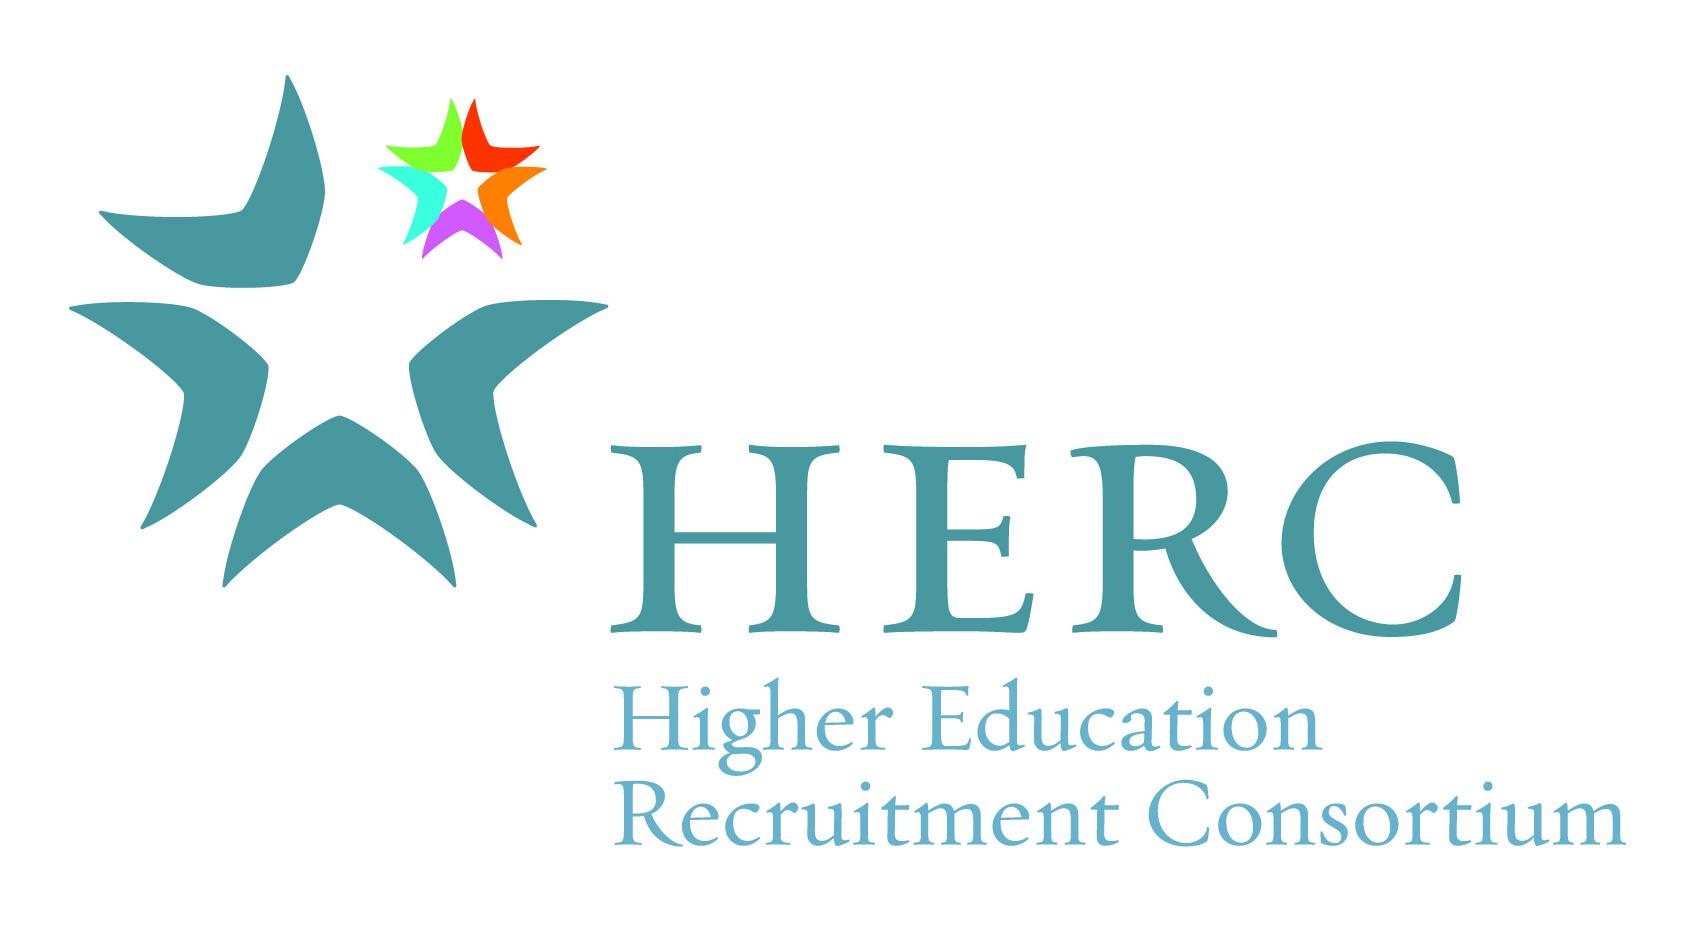 HERC_central.jpg (1698×925)